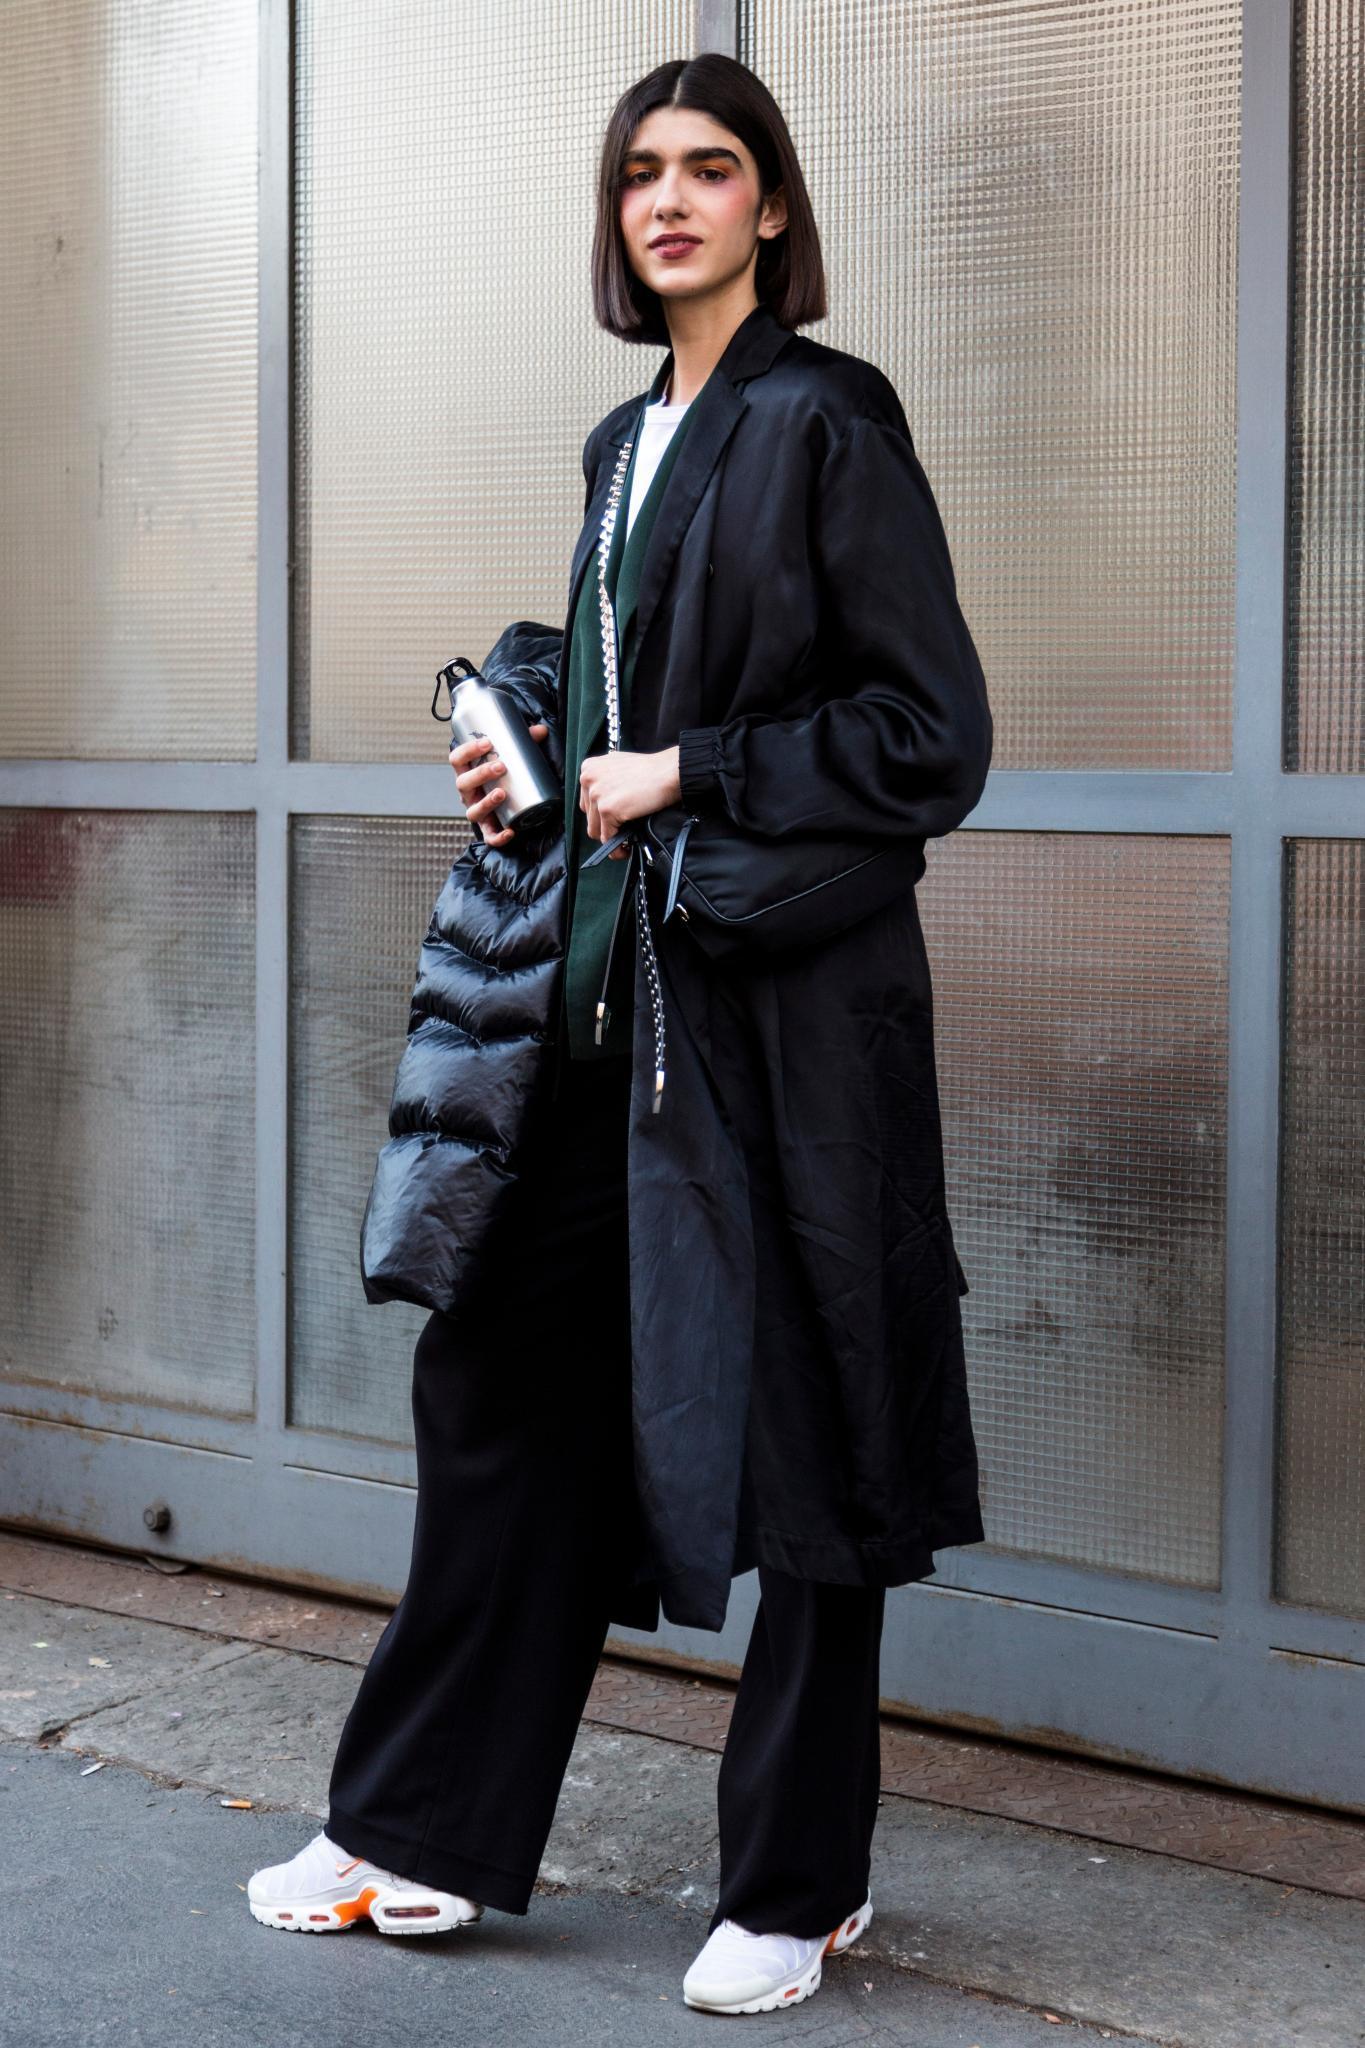 Milan Fashion Week Street Style: Woman with dark brown straight bob wearing black long coat.